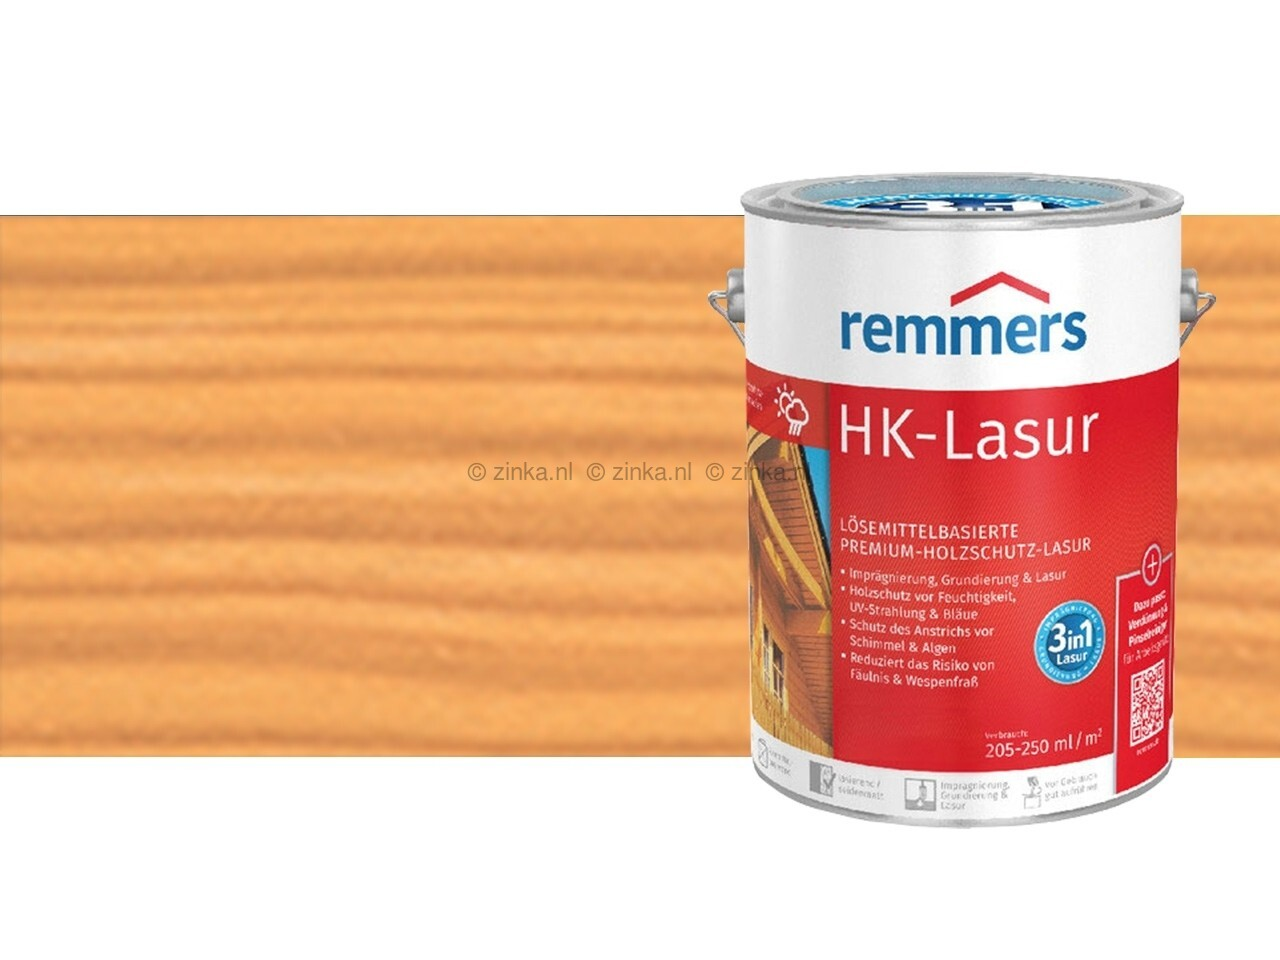 HK-Lazuur Hemlock 100 ml proefverpakking